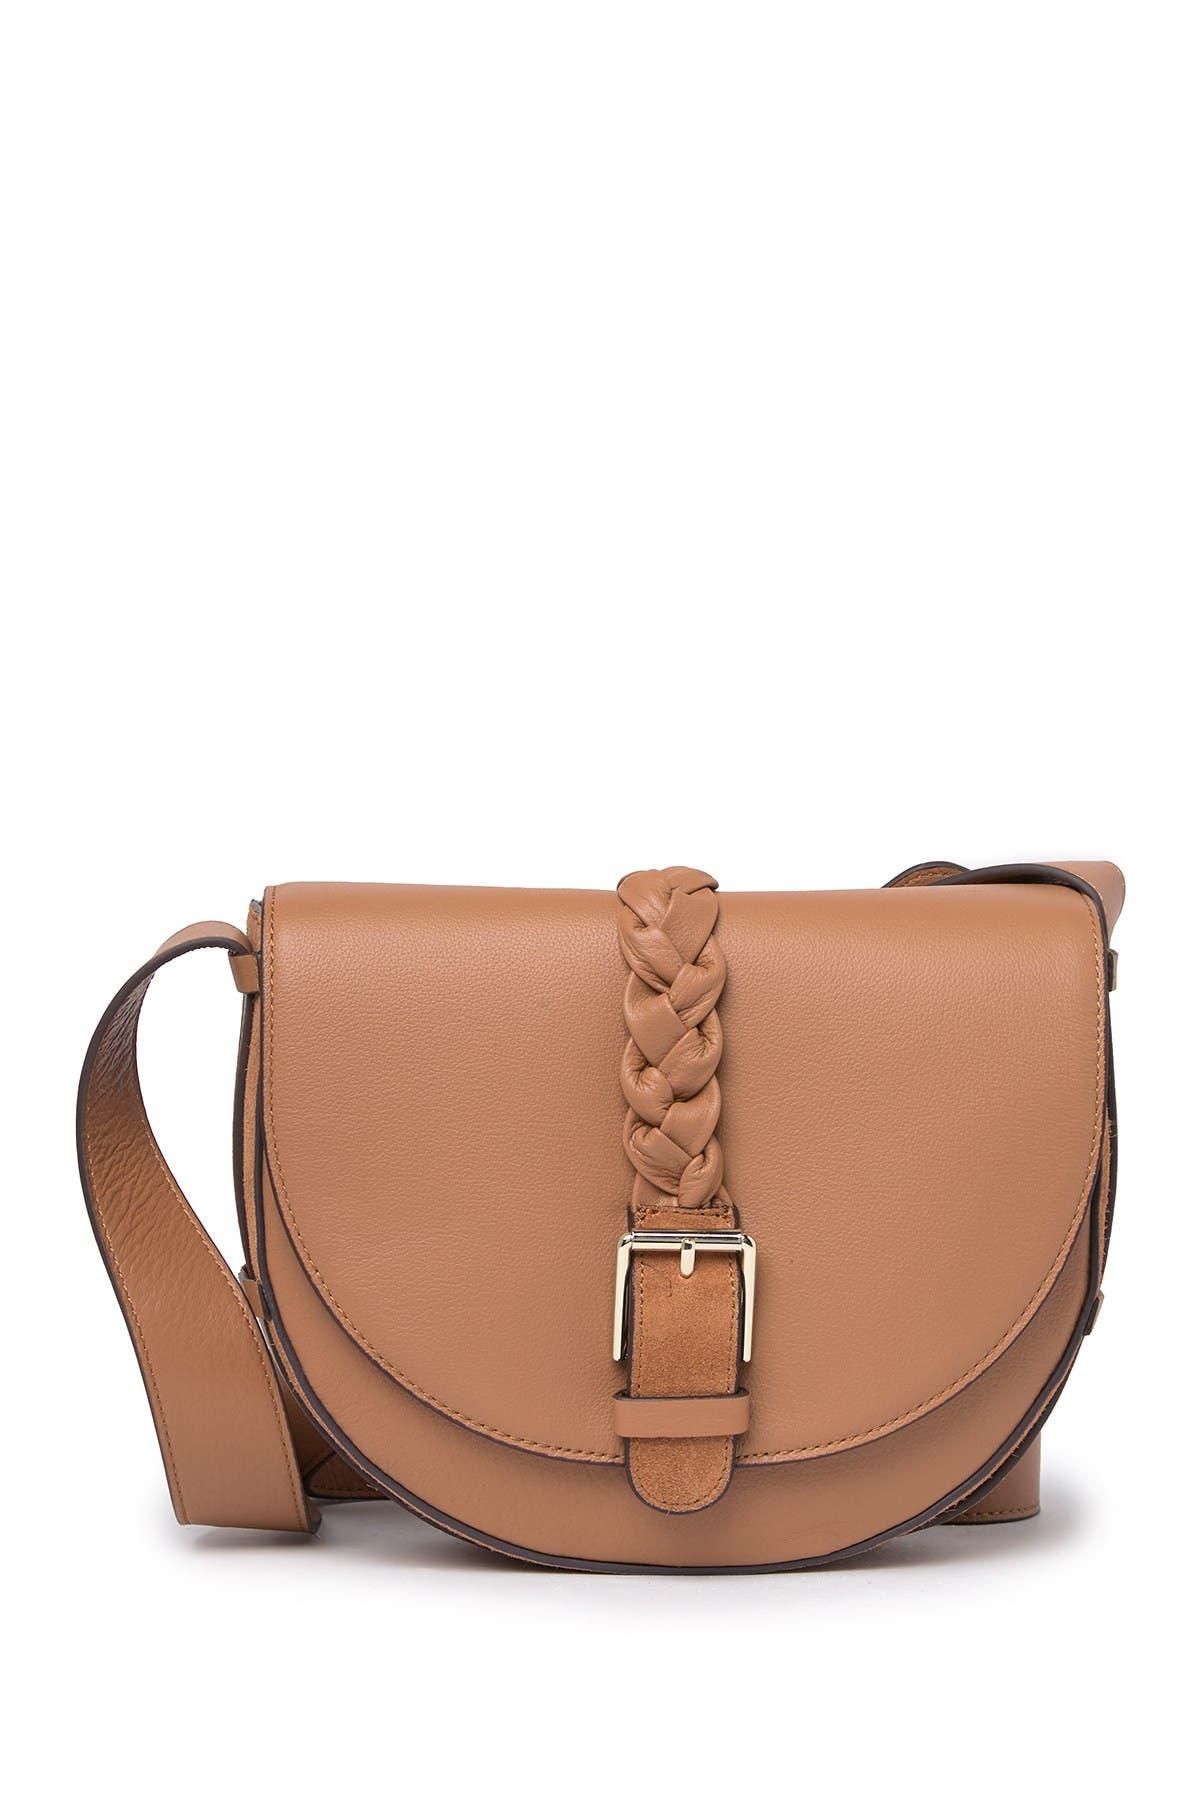 Image of Rachel Zoe Etta Leather Saddle Bag